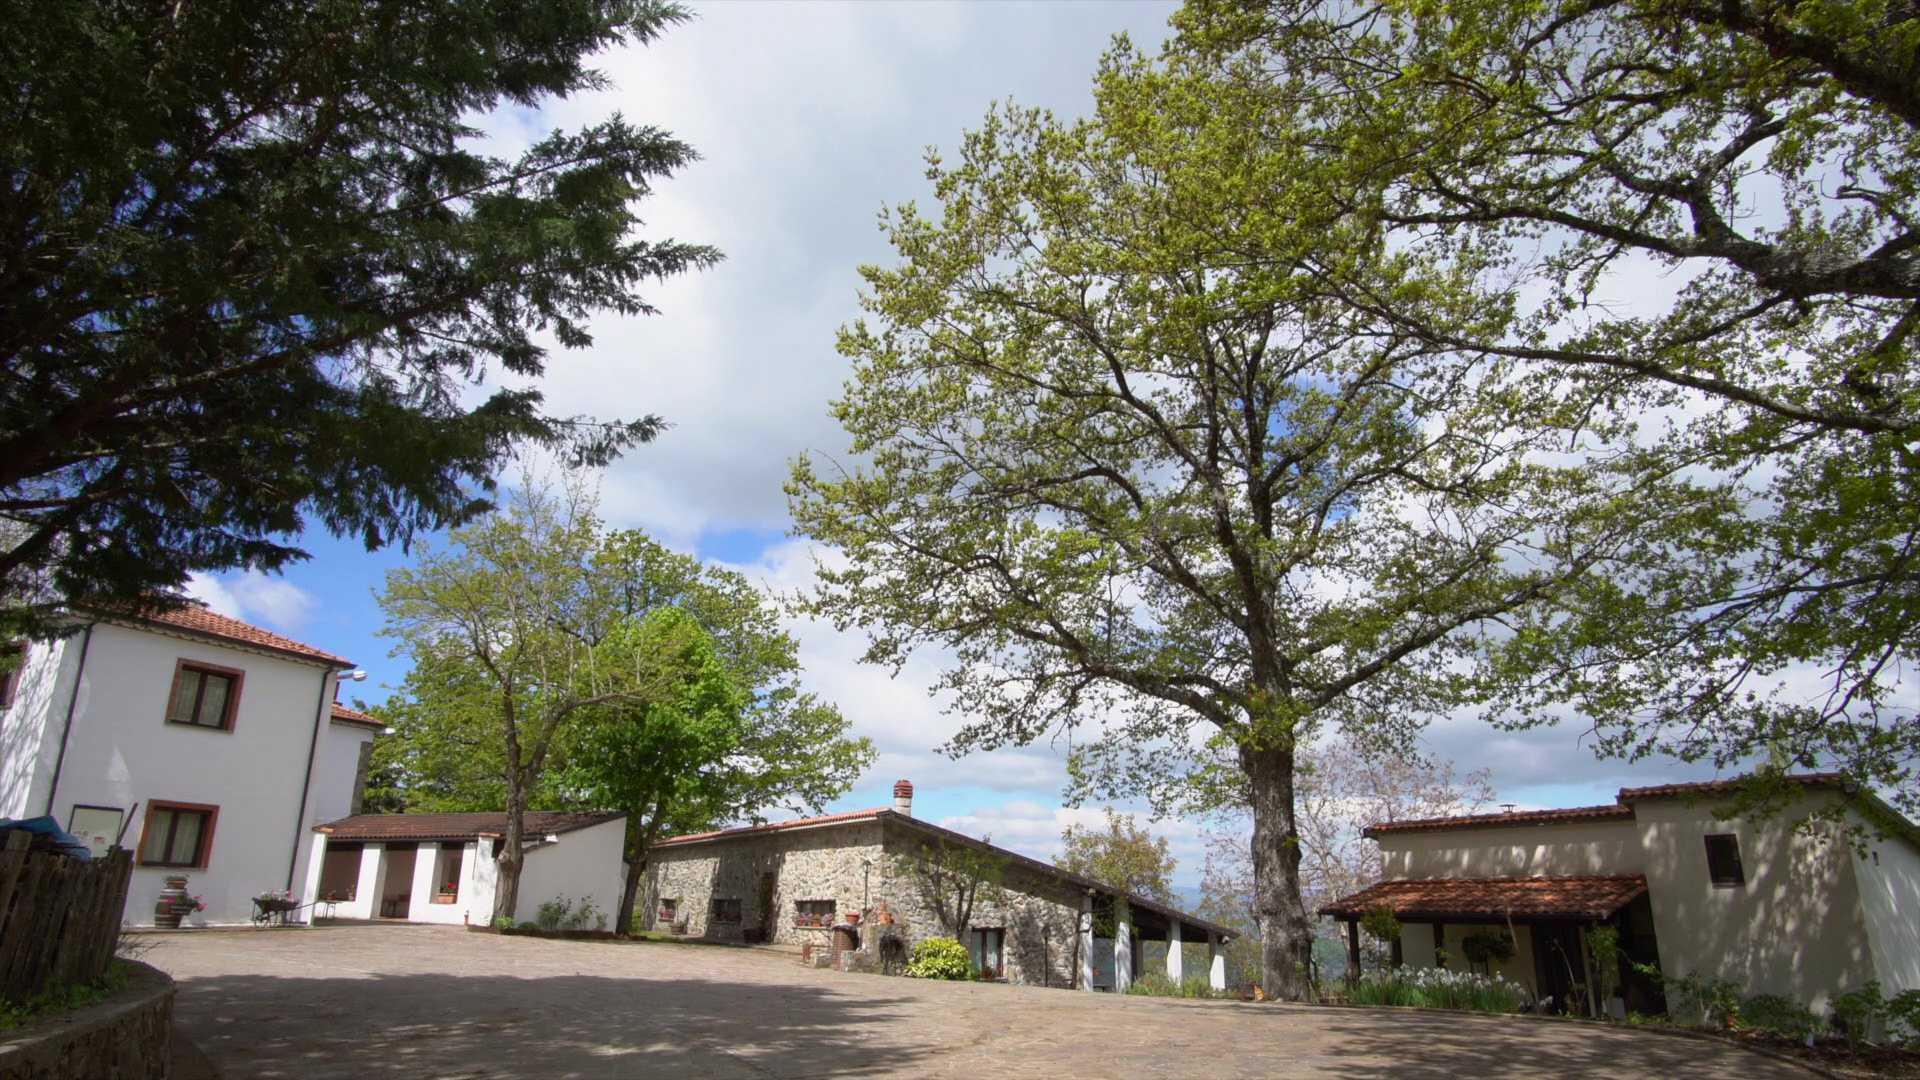 Agriturismo Acacia posto dove riconnette se stessi